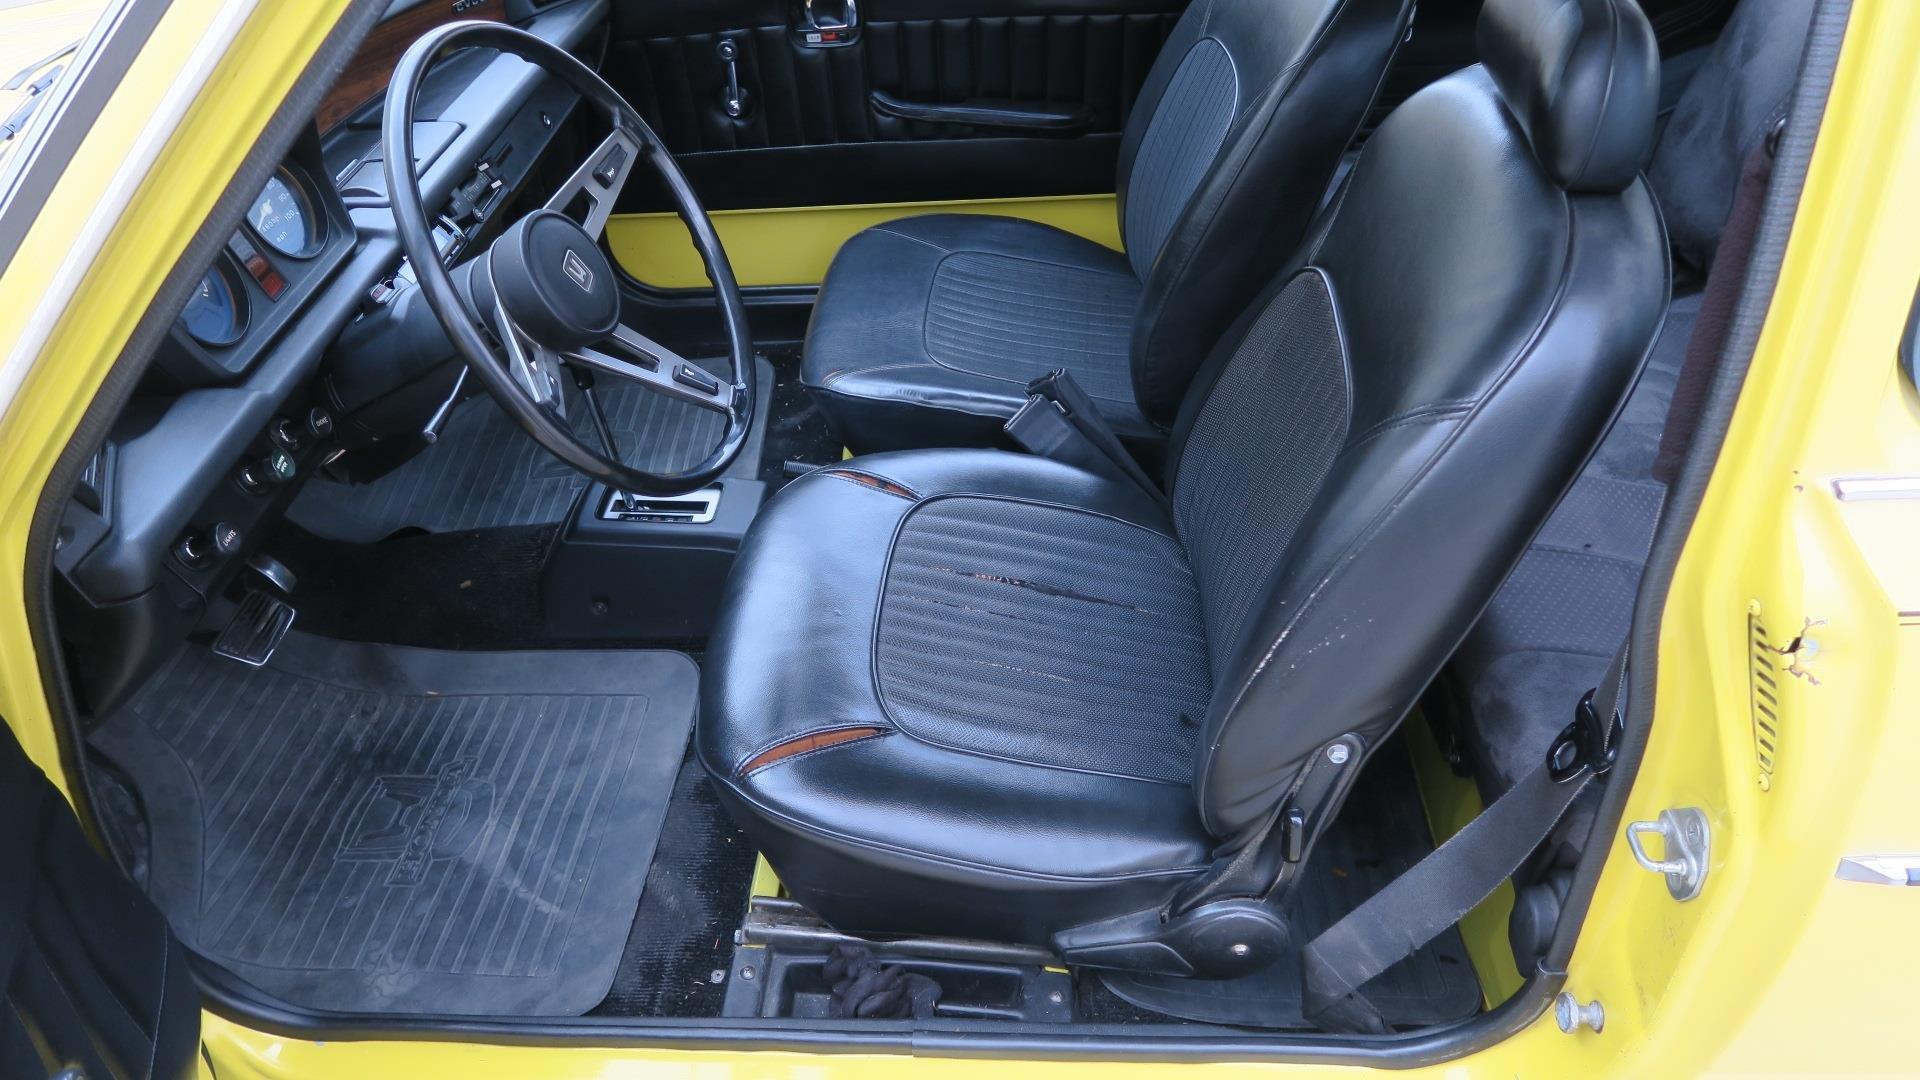 1975 Honda Civic CVCC very Rare 2 Auto Trans $8k spent $8.9  For Sale (picture 4 of 6)